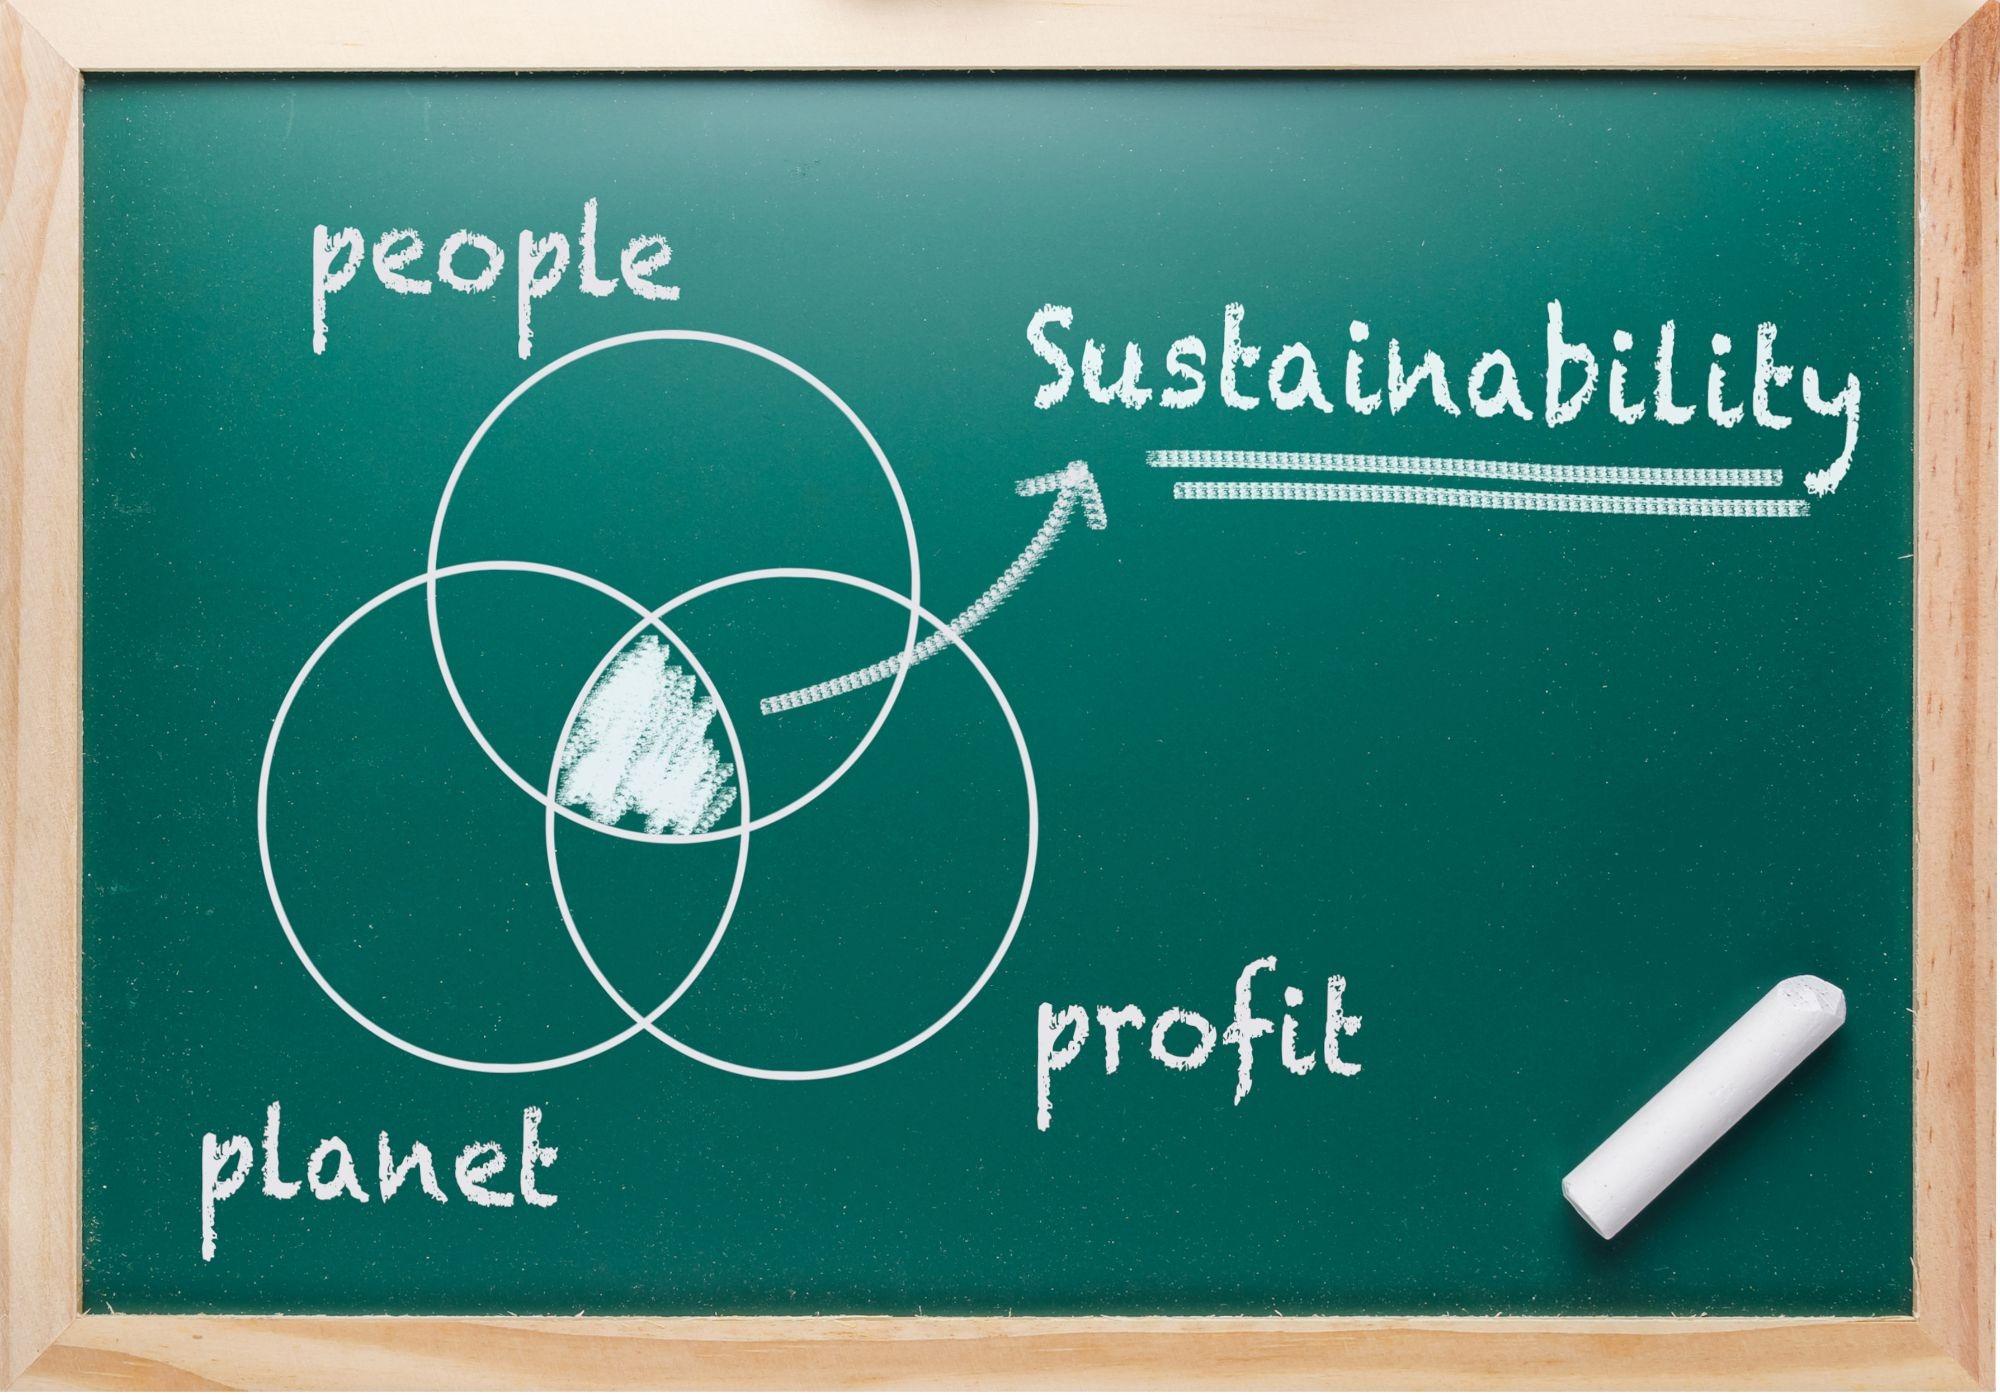 sostenibilitambientale-1604339970.jpg